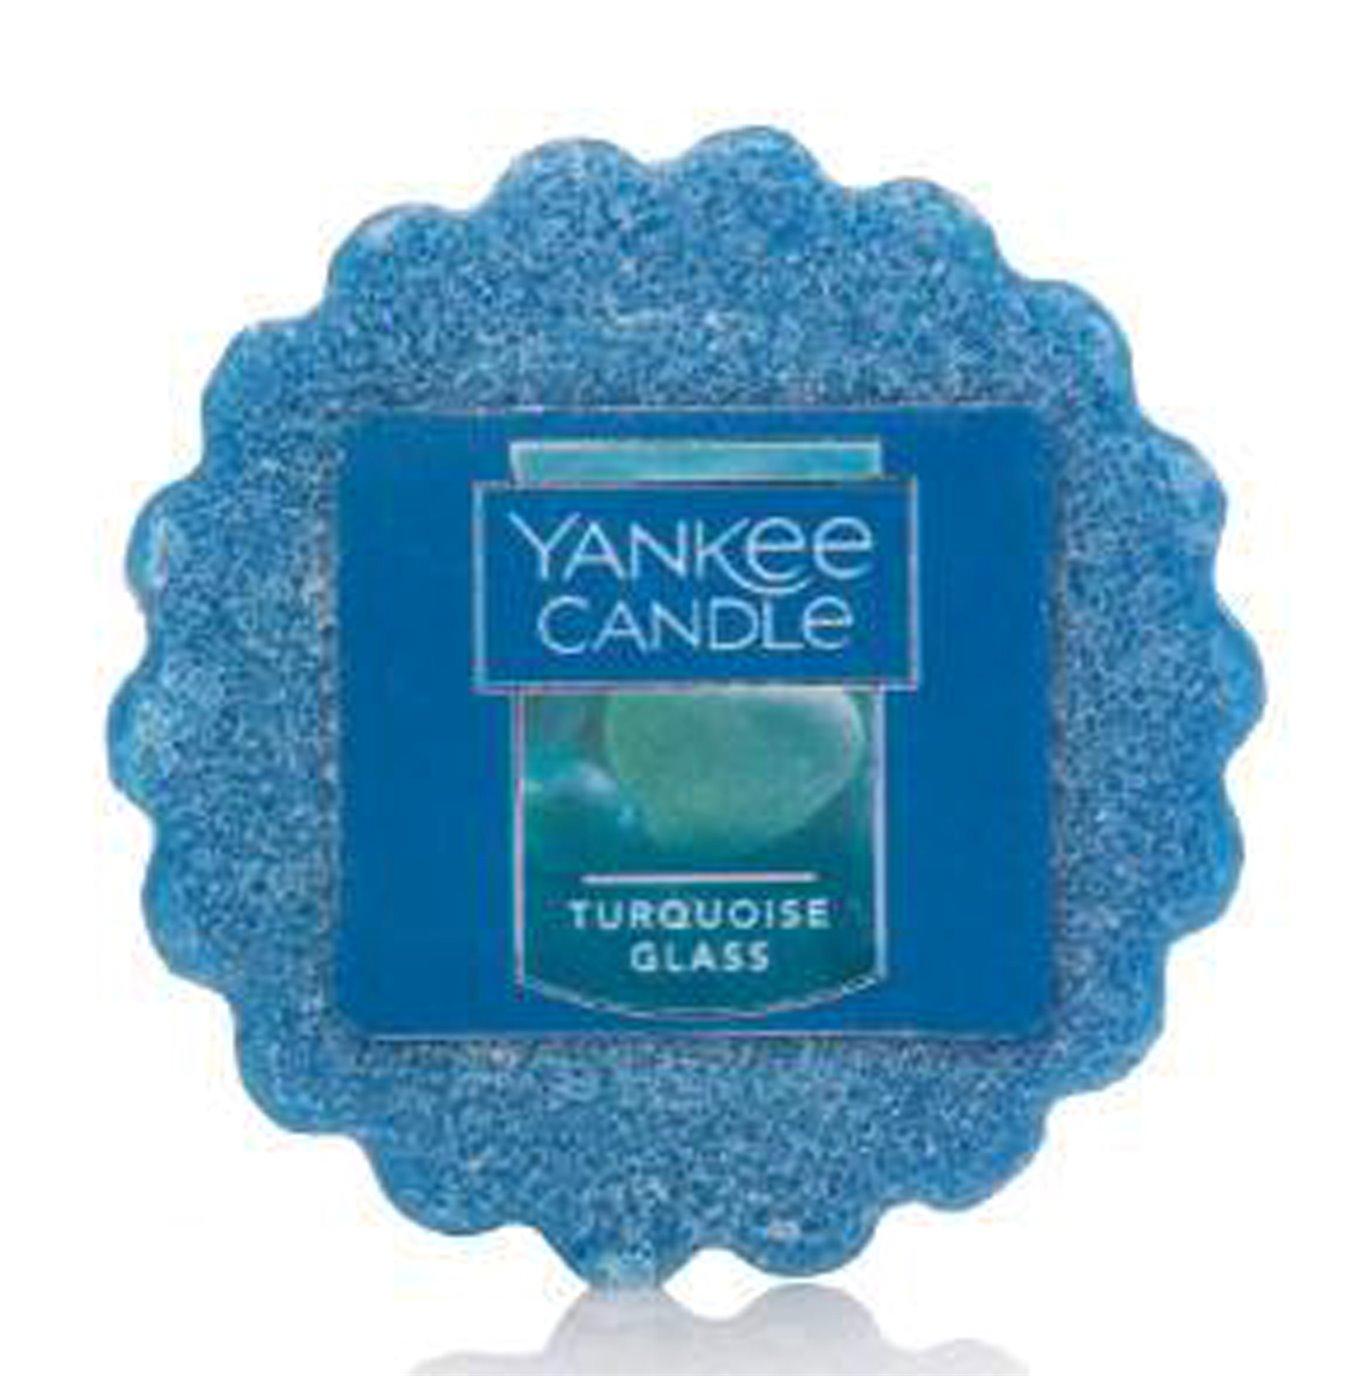 Yankee Candle Turquoise Glass Tarts Wax Potpourri